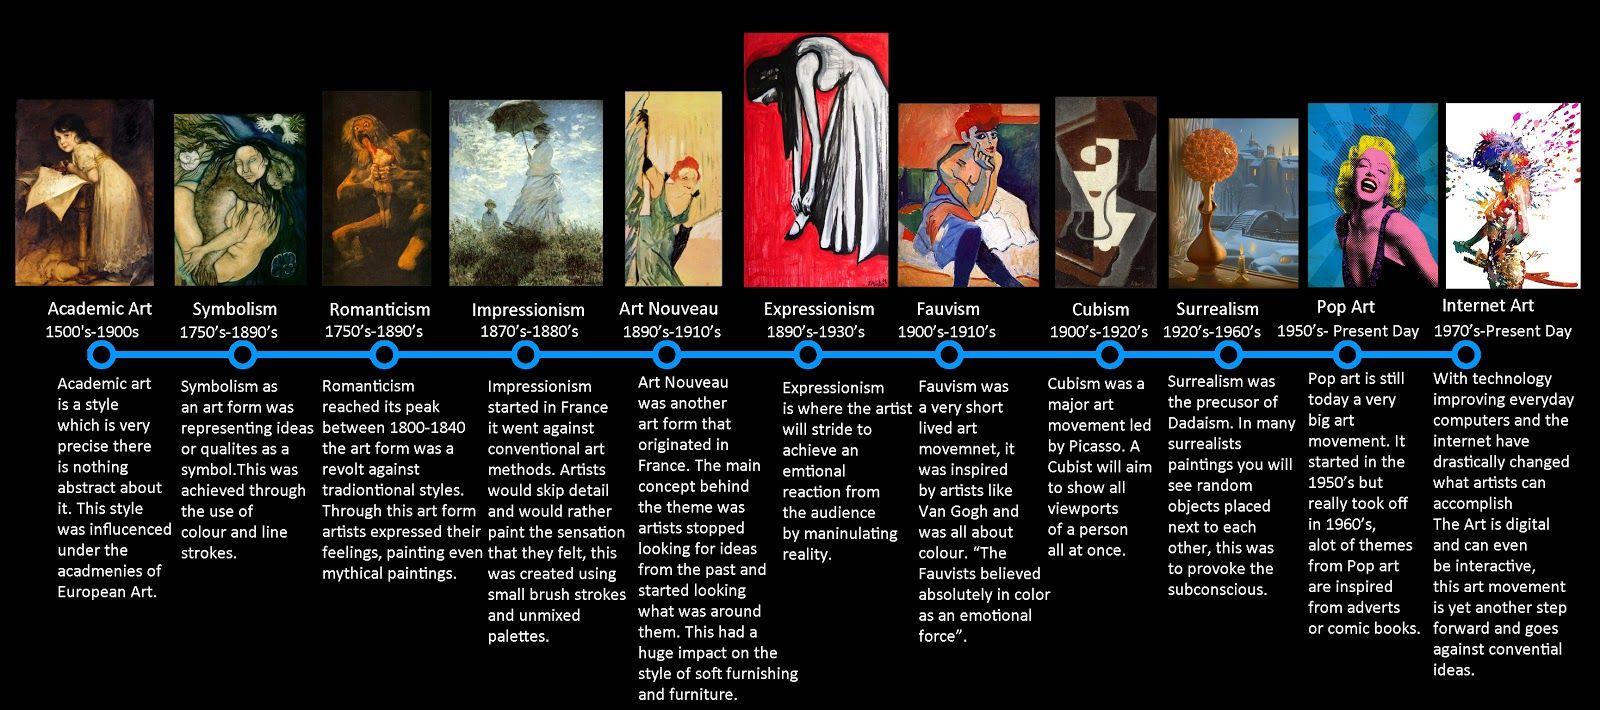 Timeline of art movements image art teacher pinterest art timeline of art movements image altavistaventures Images